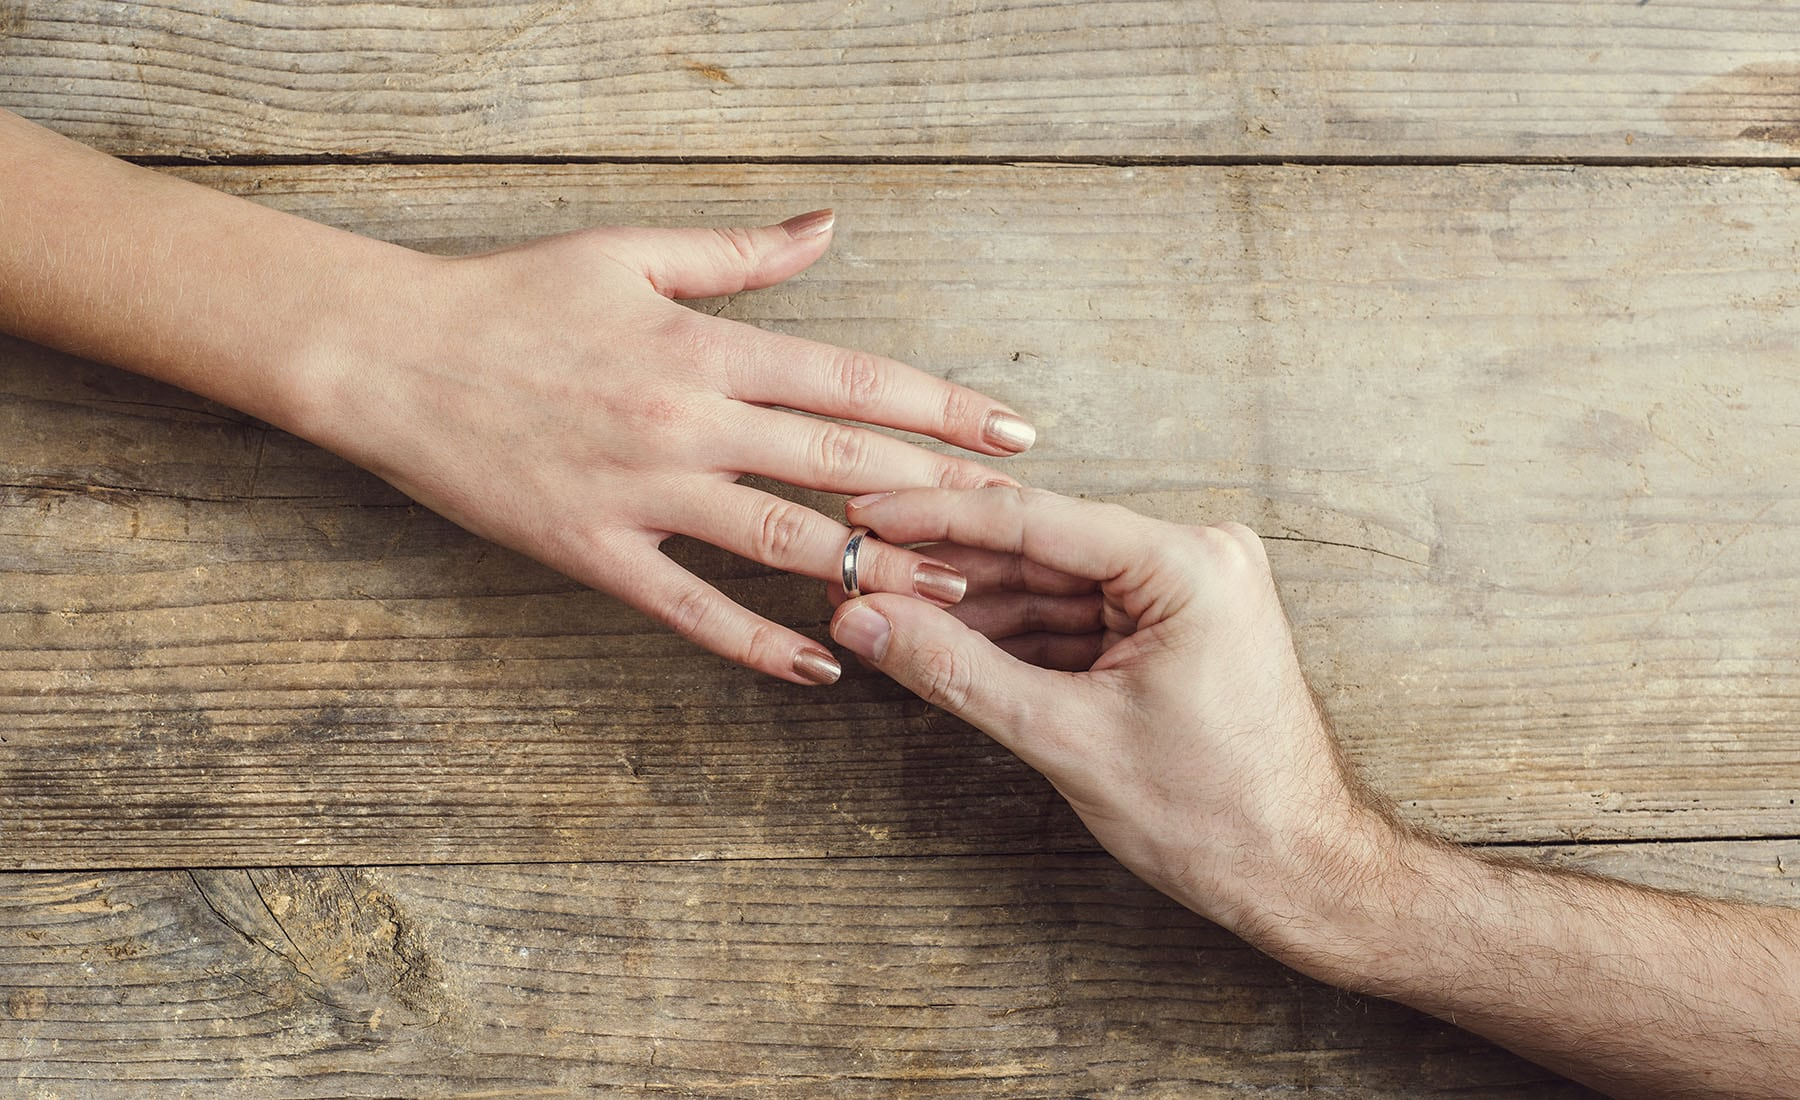 Matrimonios Exitosos Biblia : Valores en común para toda pareja por tu matrimonio